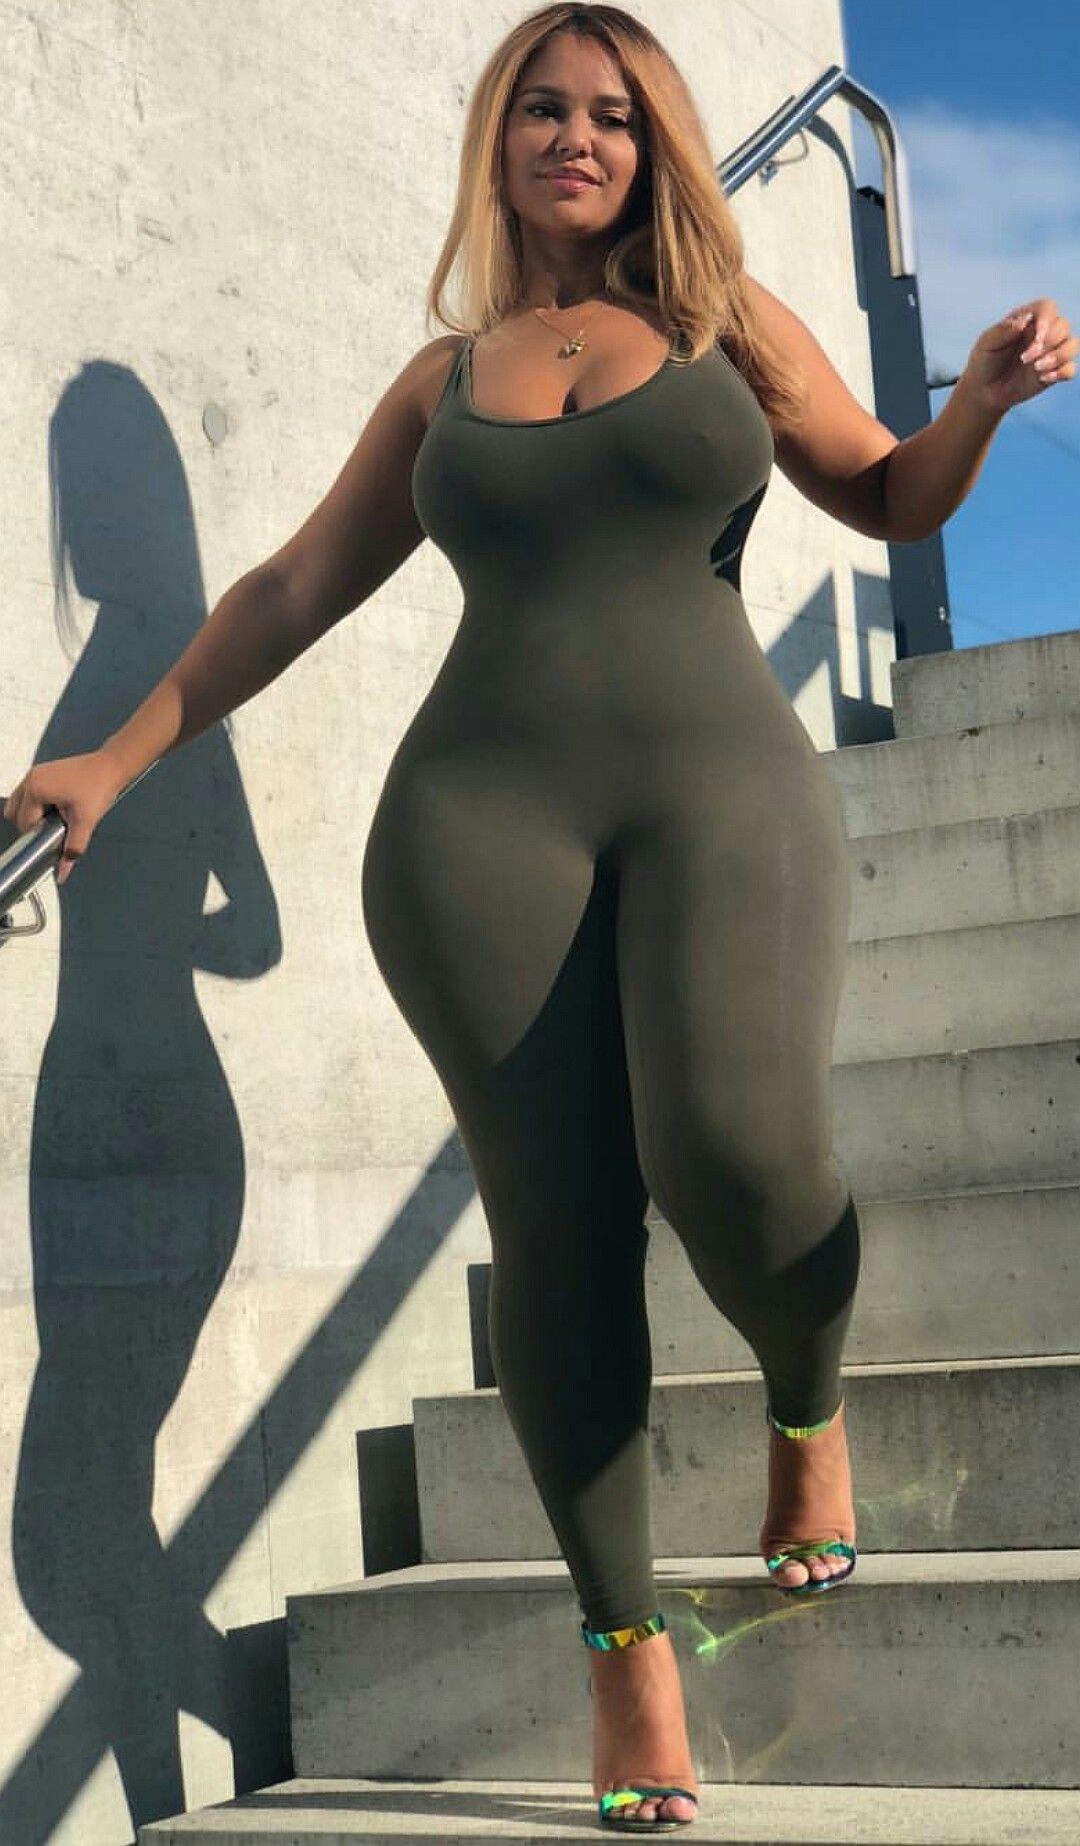 Sandee westgate anal